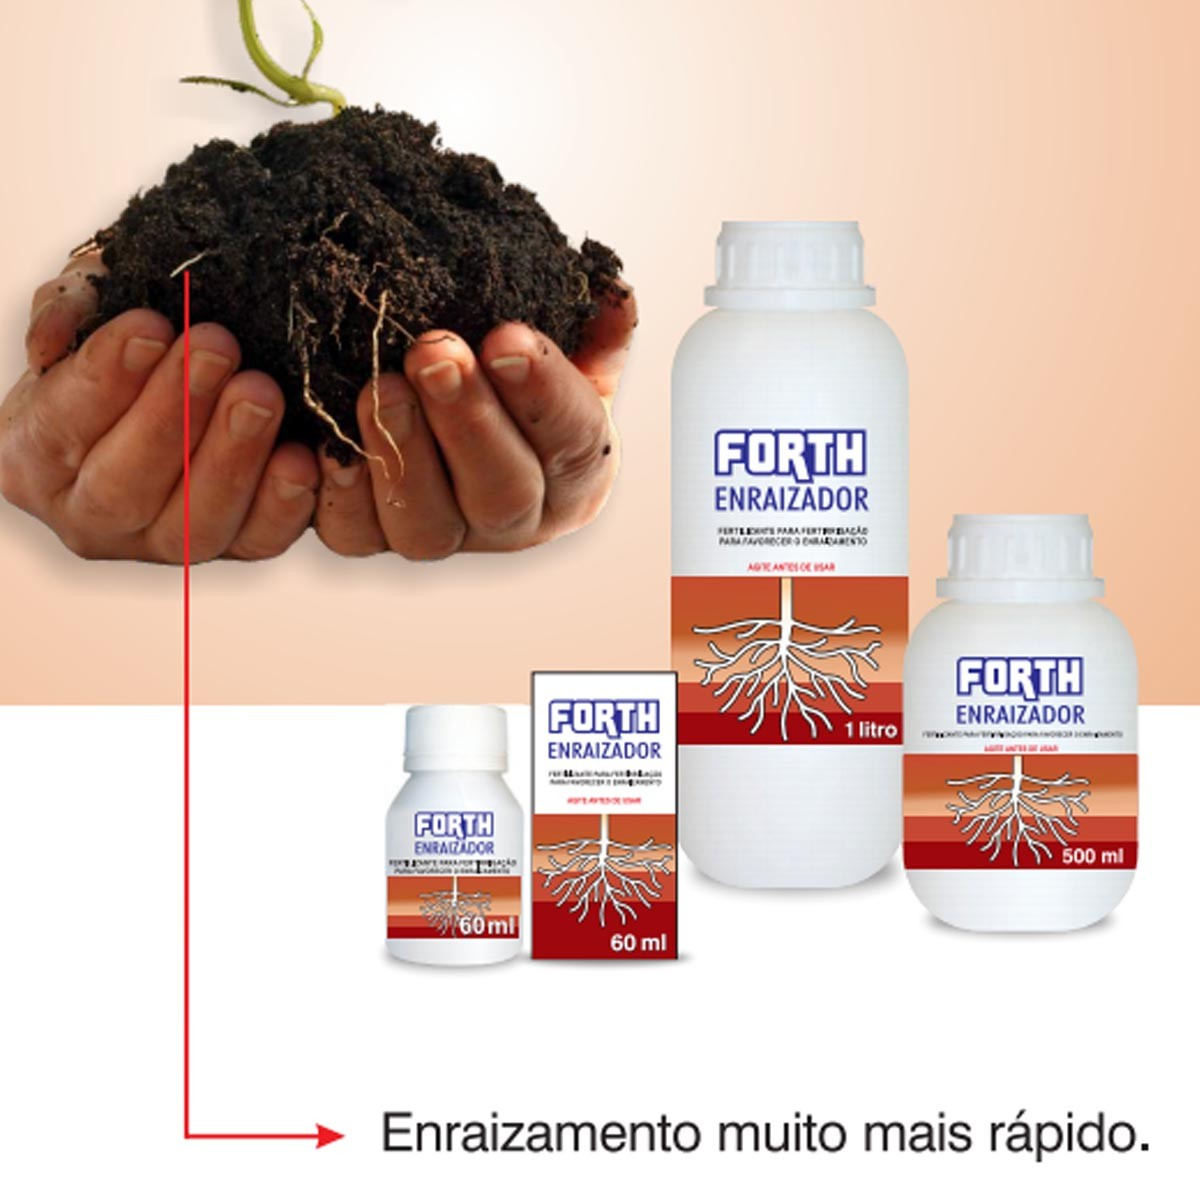 Fertilizante Forth Enraizador 500ml